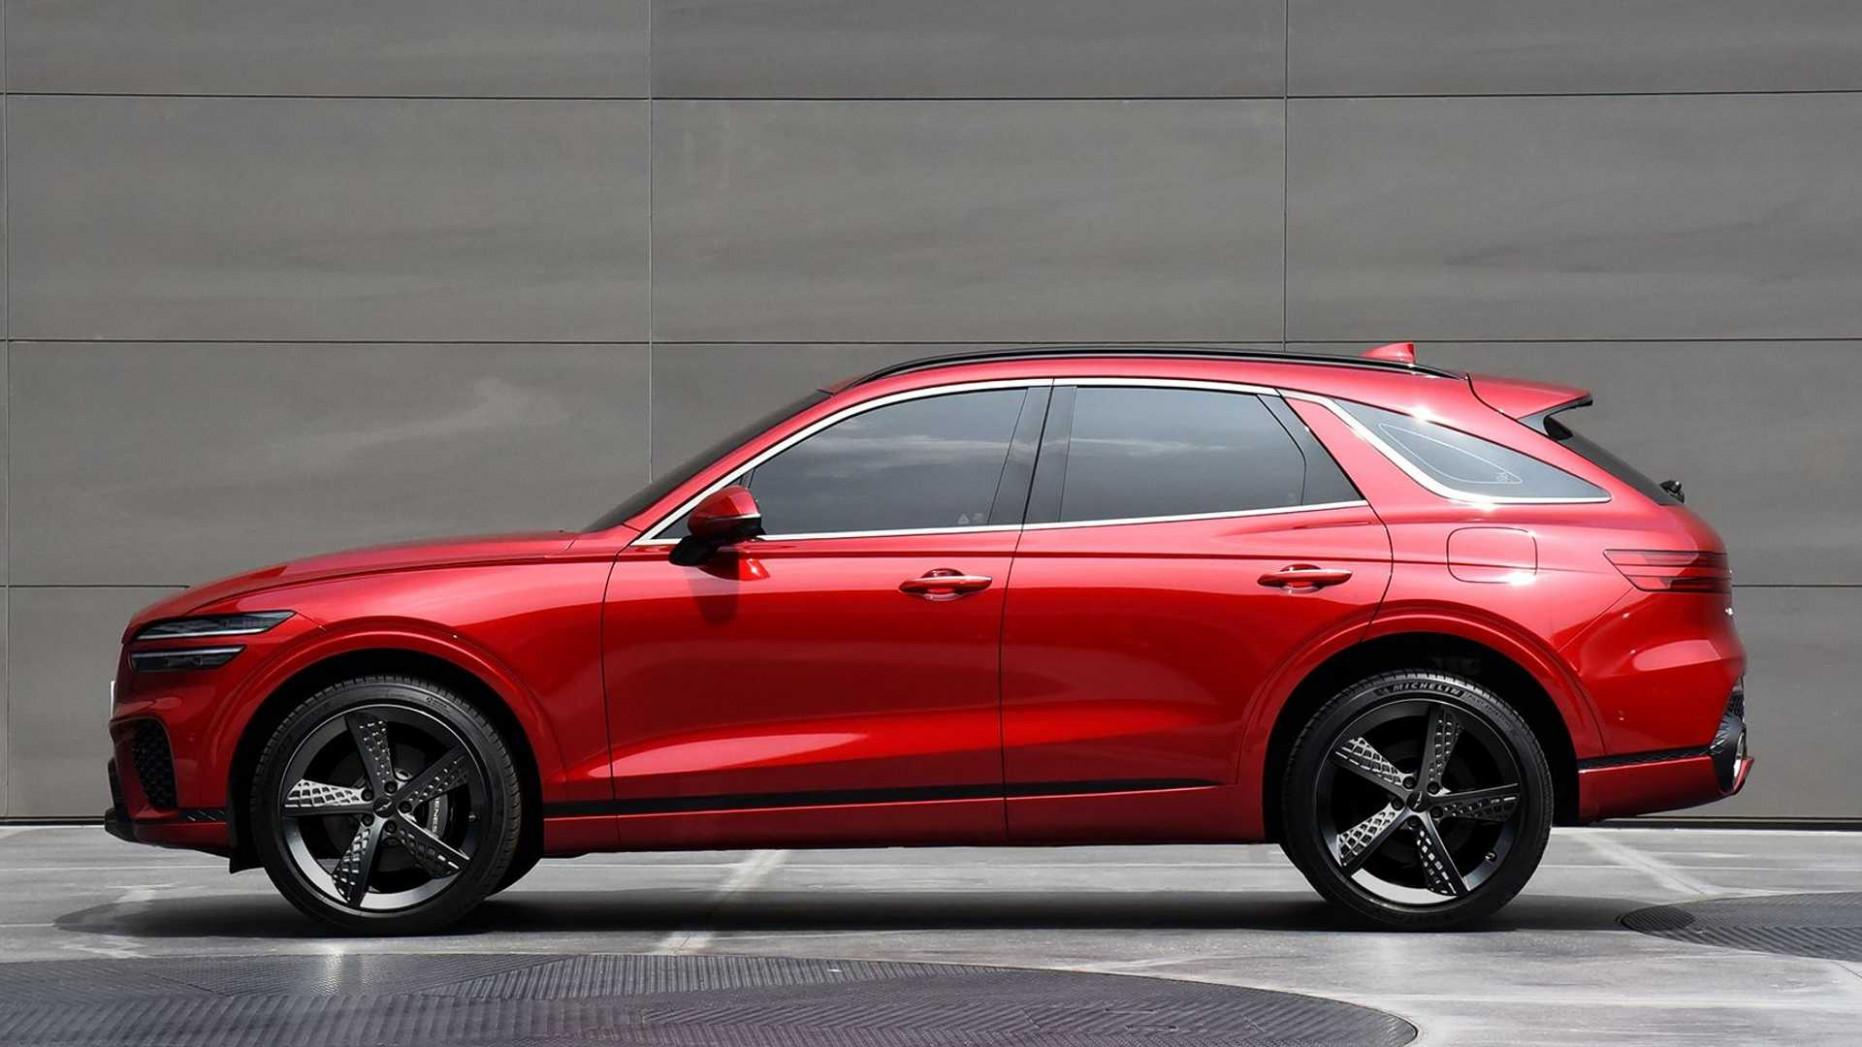 Redesign and Concept 2022 Hyundai Genesis